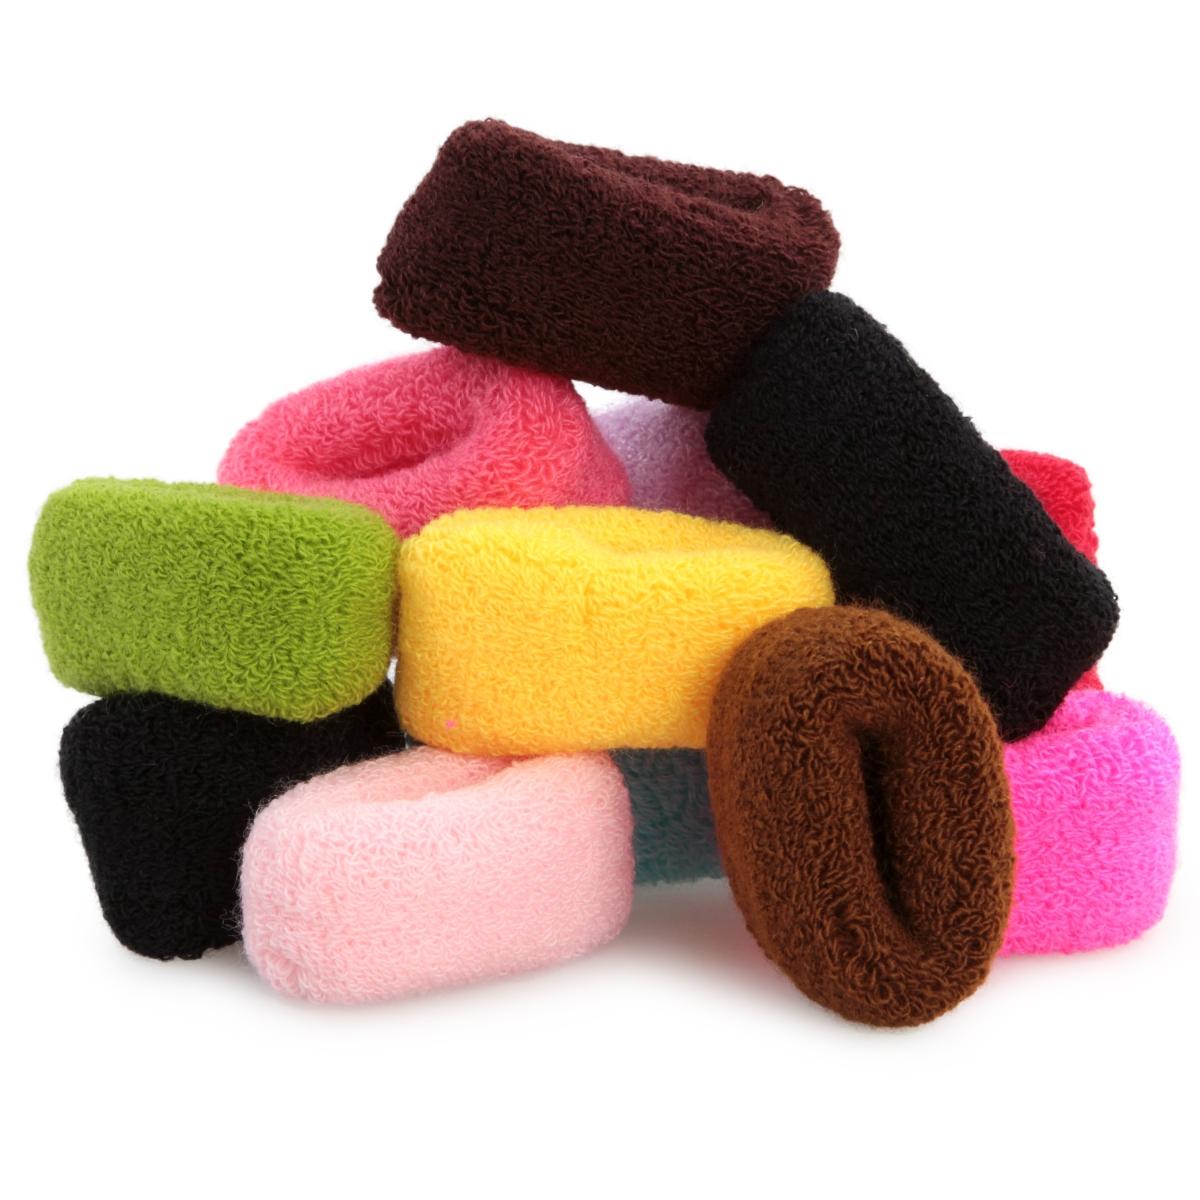 12 ks XL silné gumičky do vlasů  froté, elastické